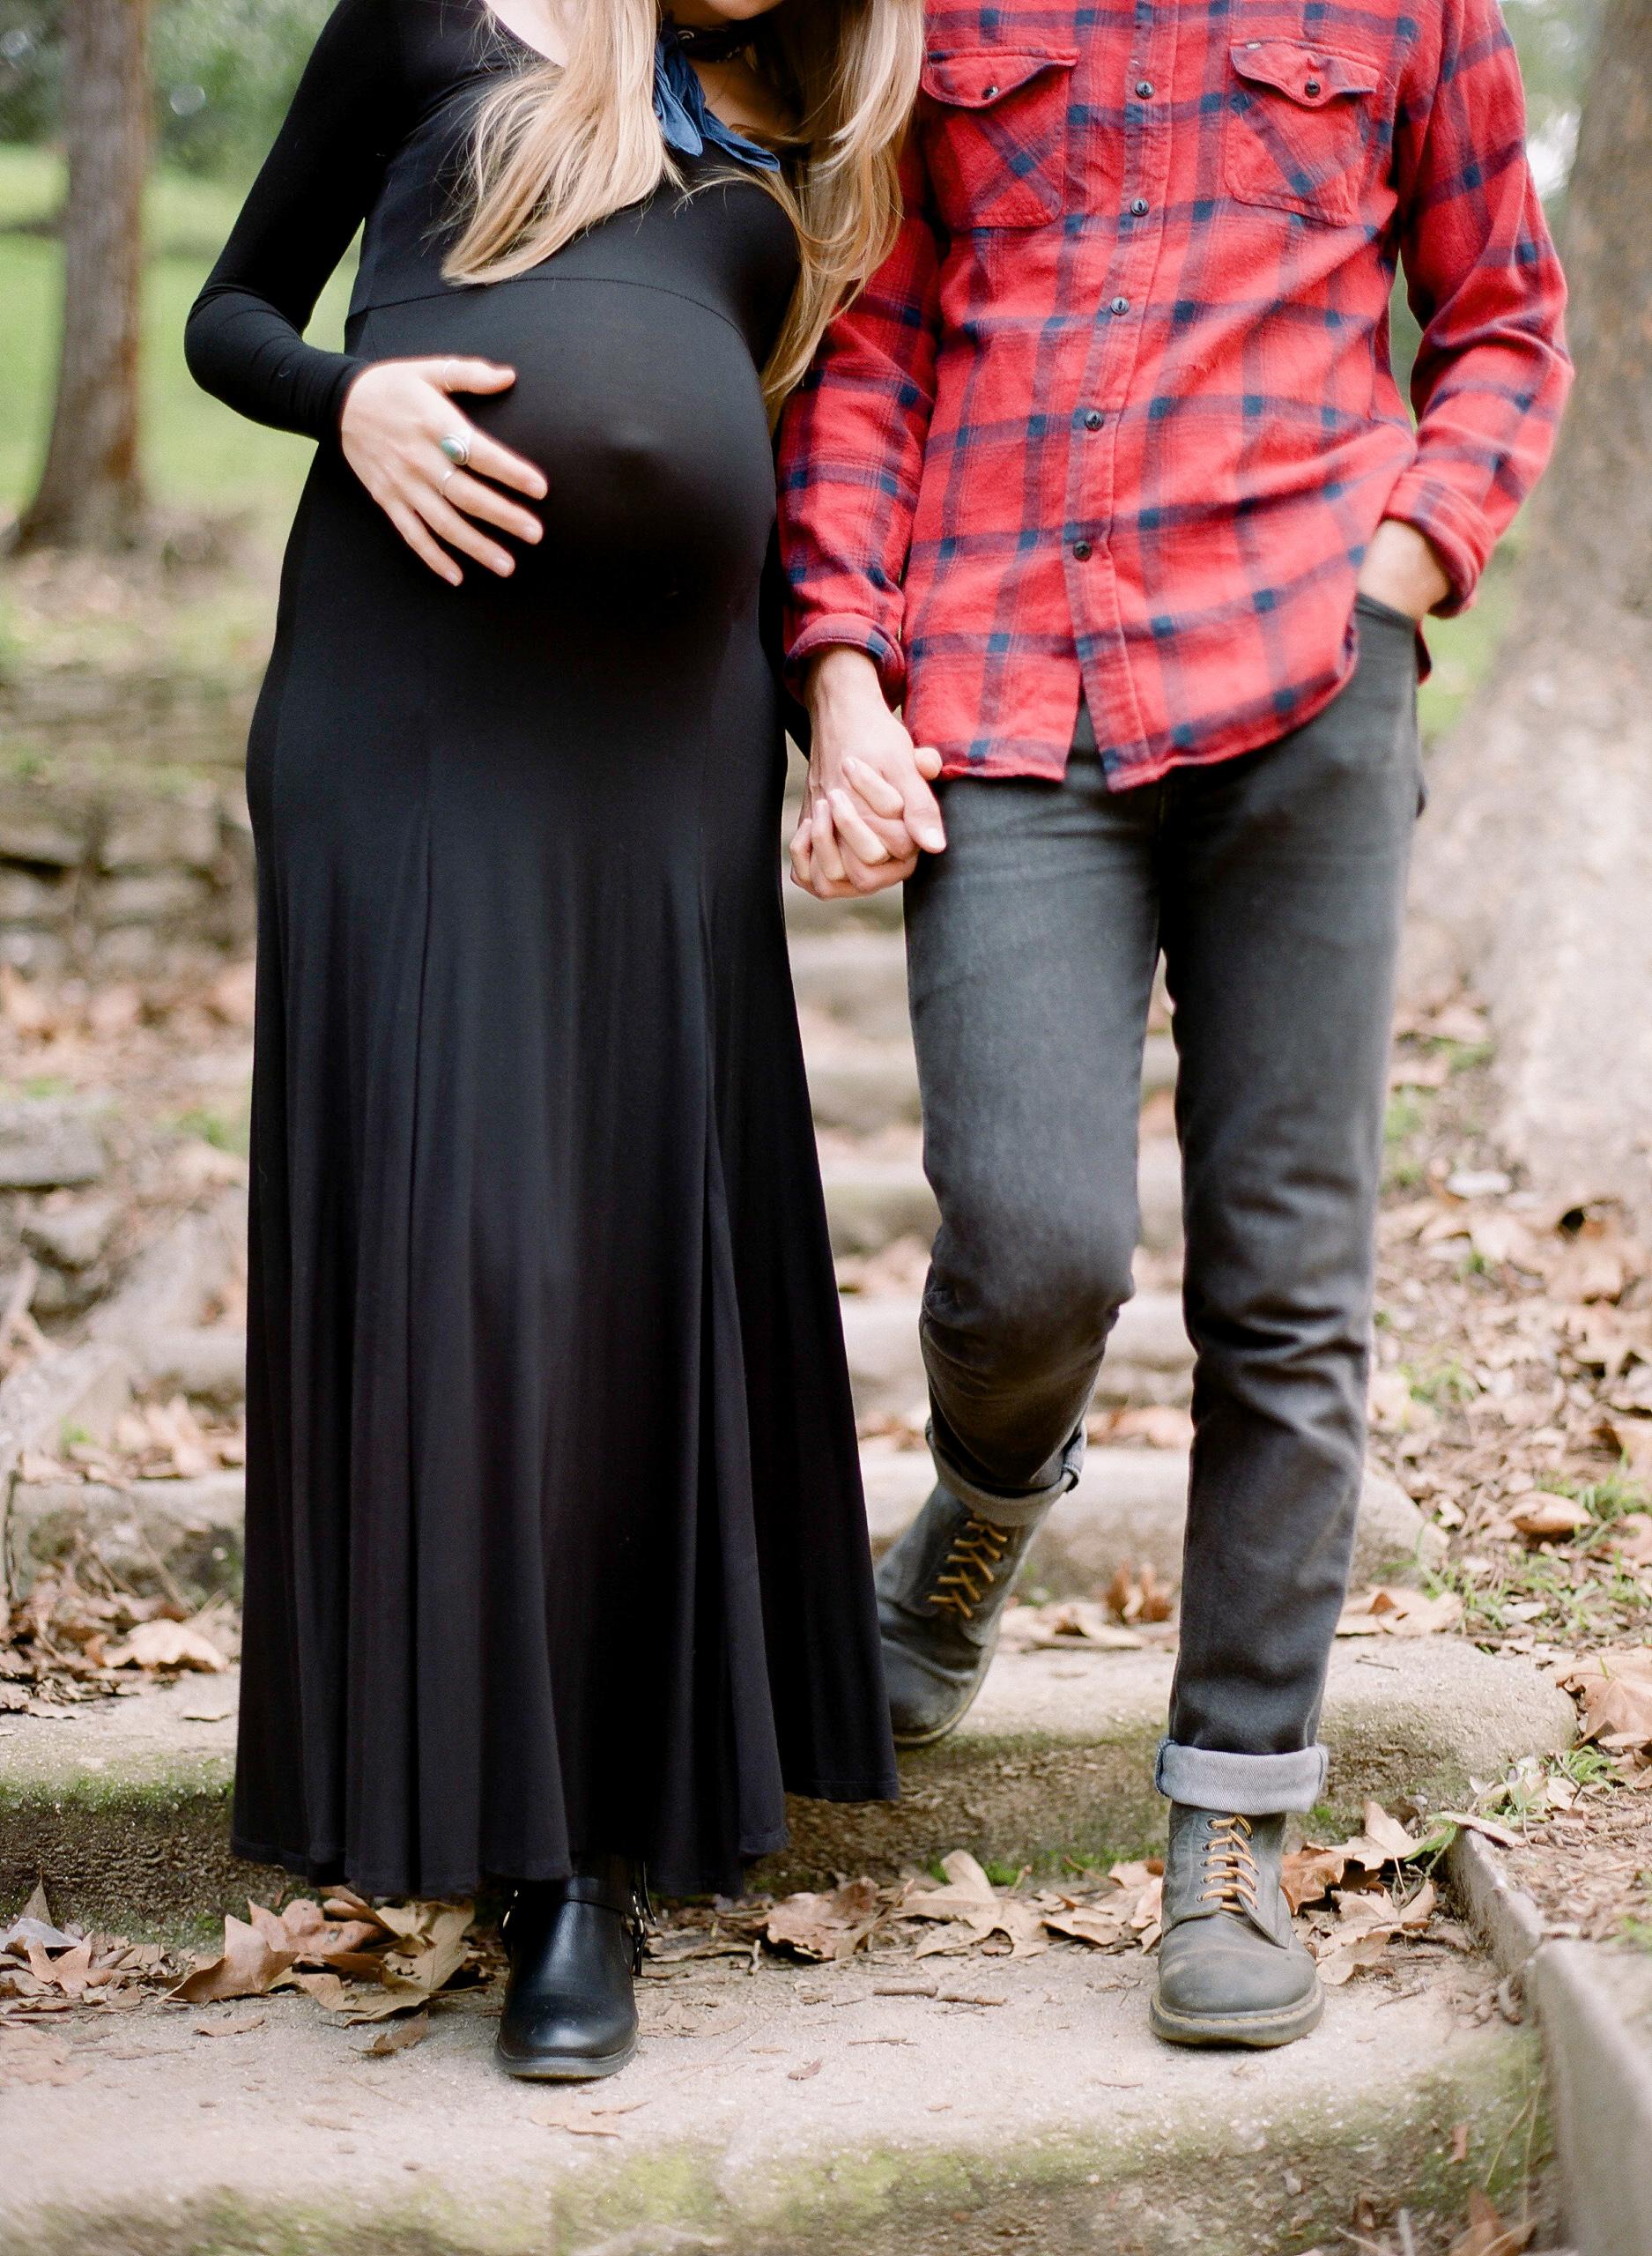 Chrissy & David Maternity Session-40.jpg